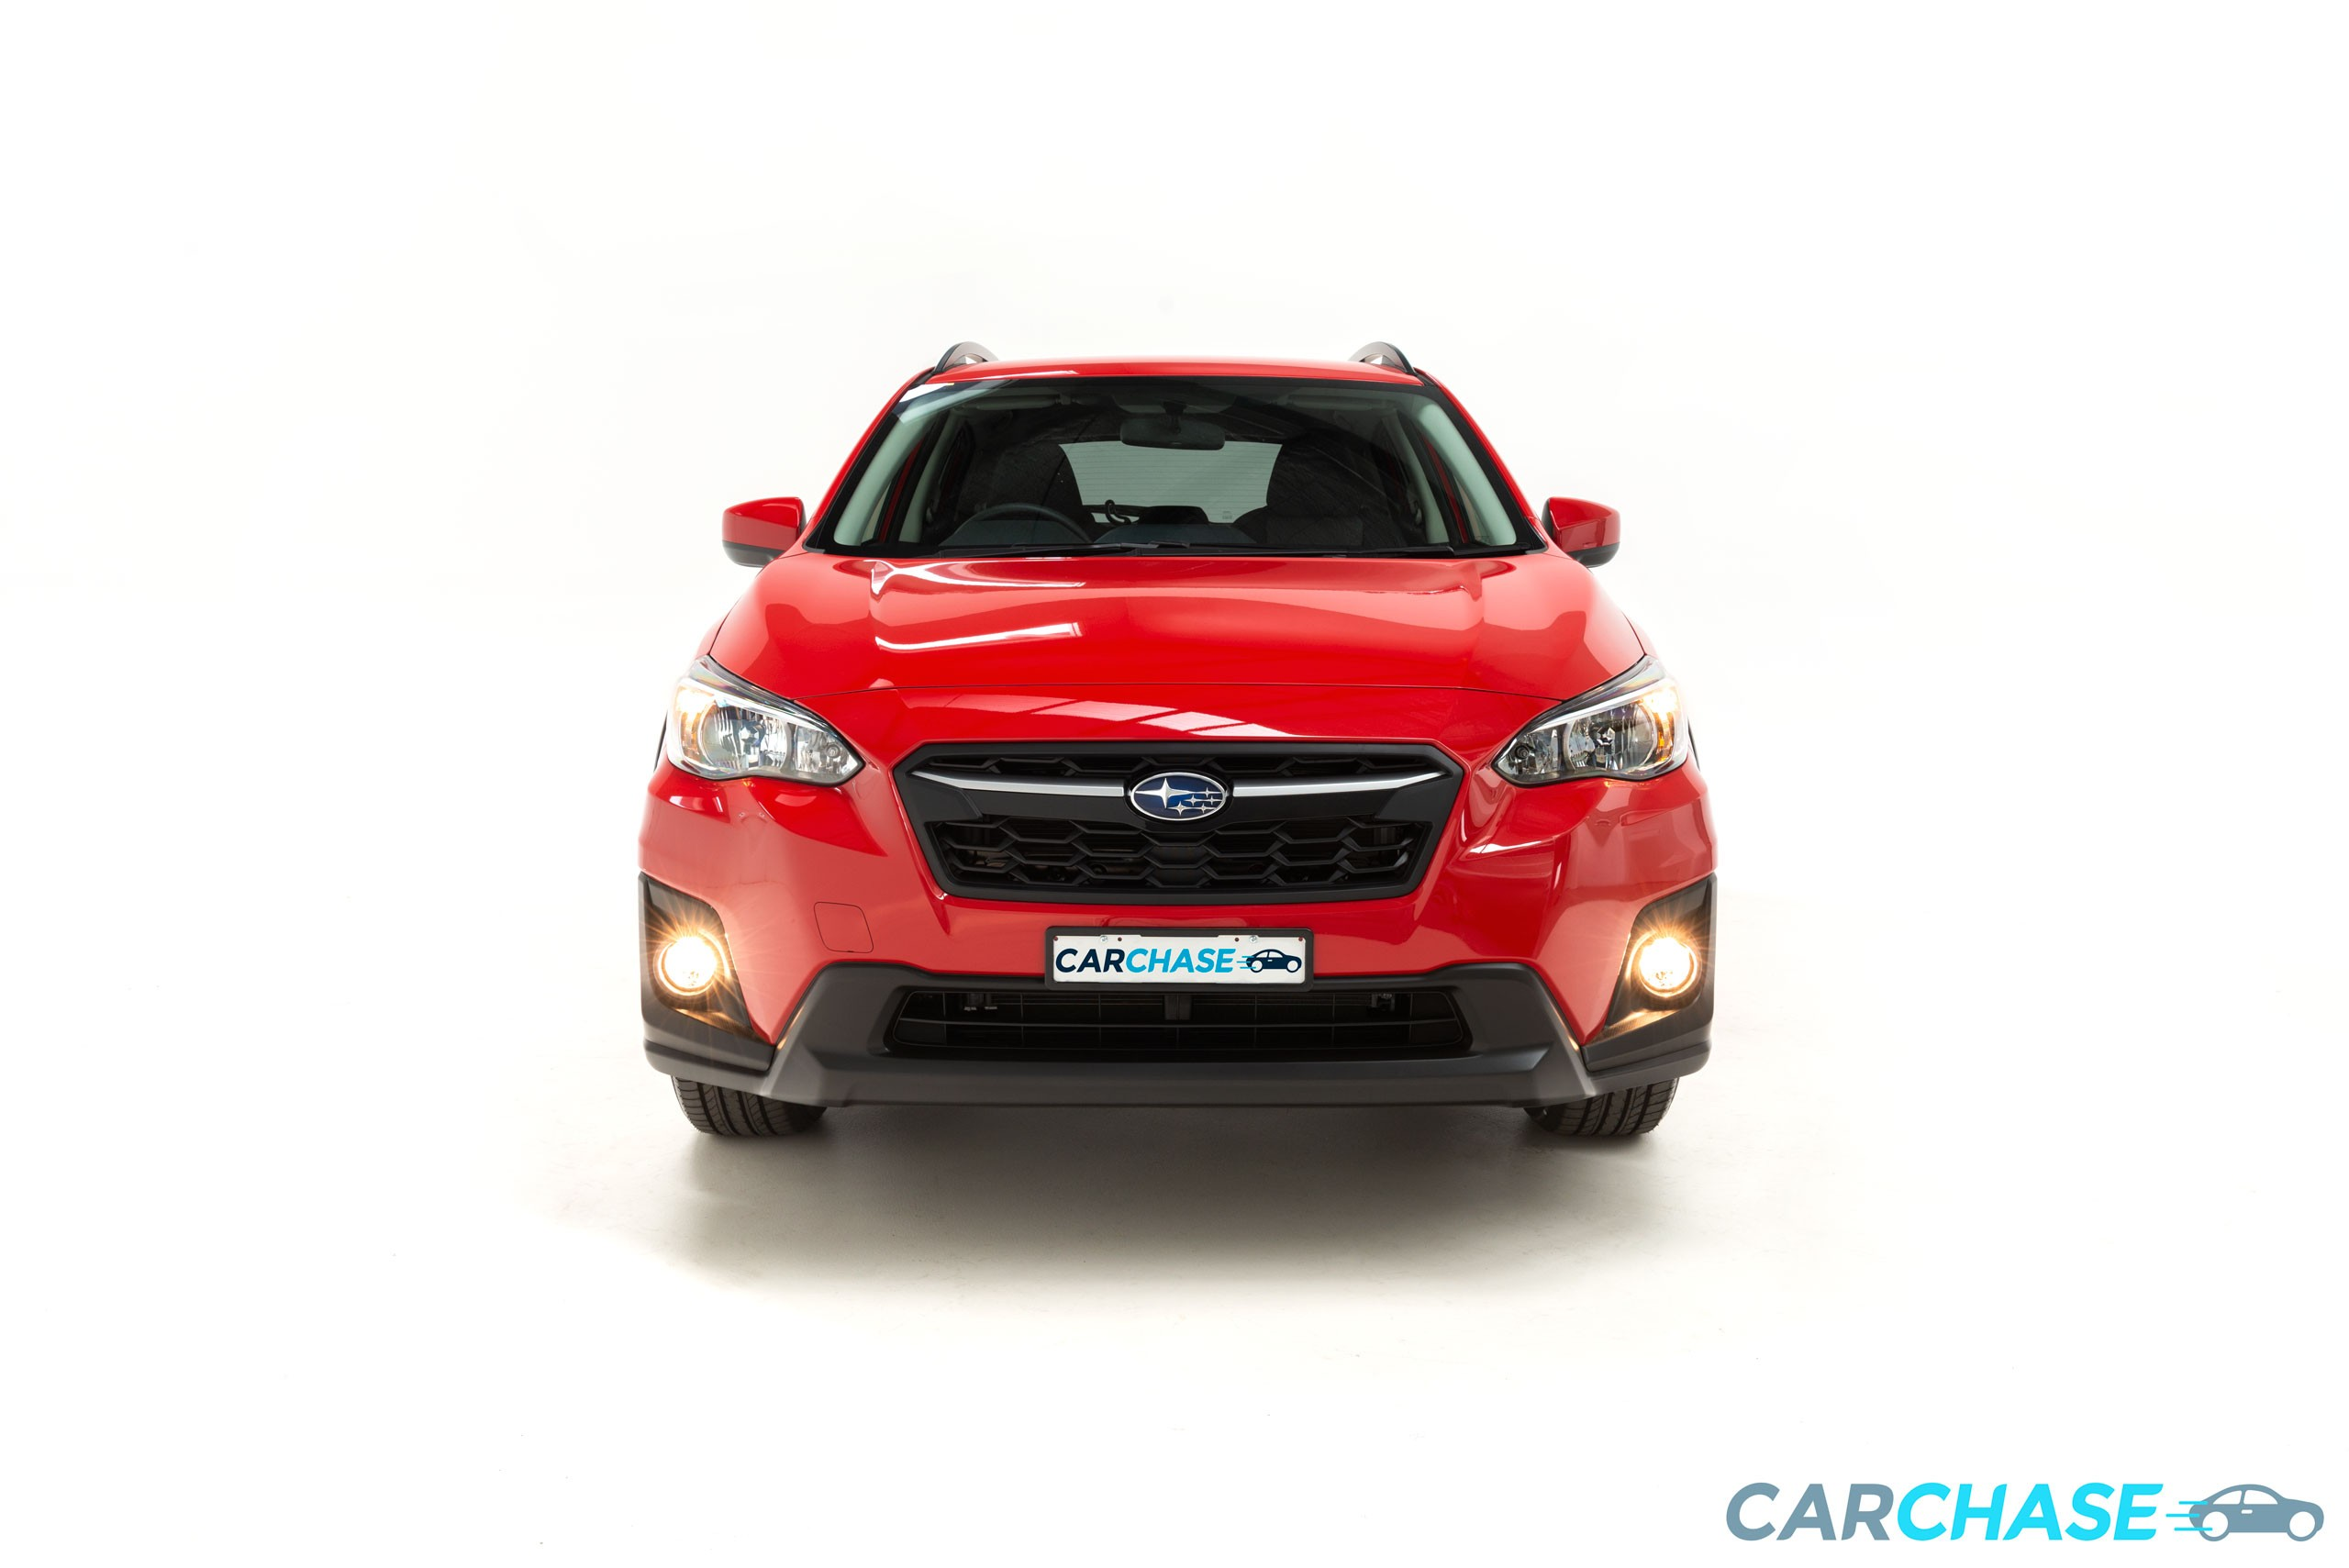 Image of front profile of 2018 Subaru XV 2.0i